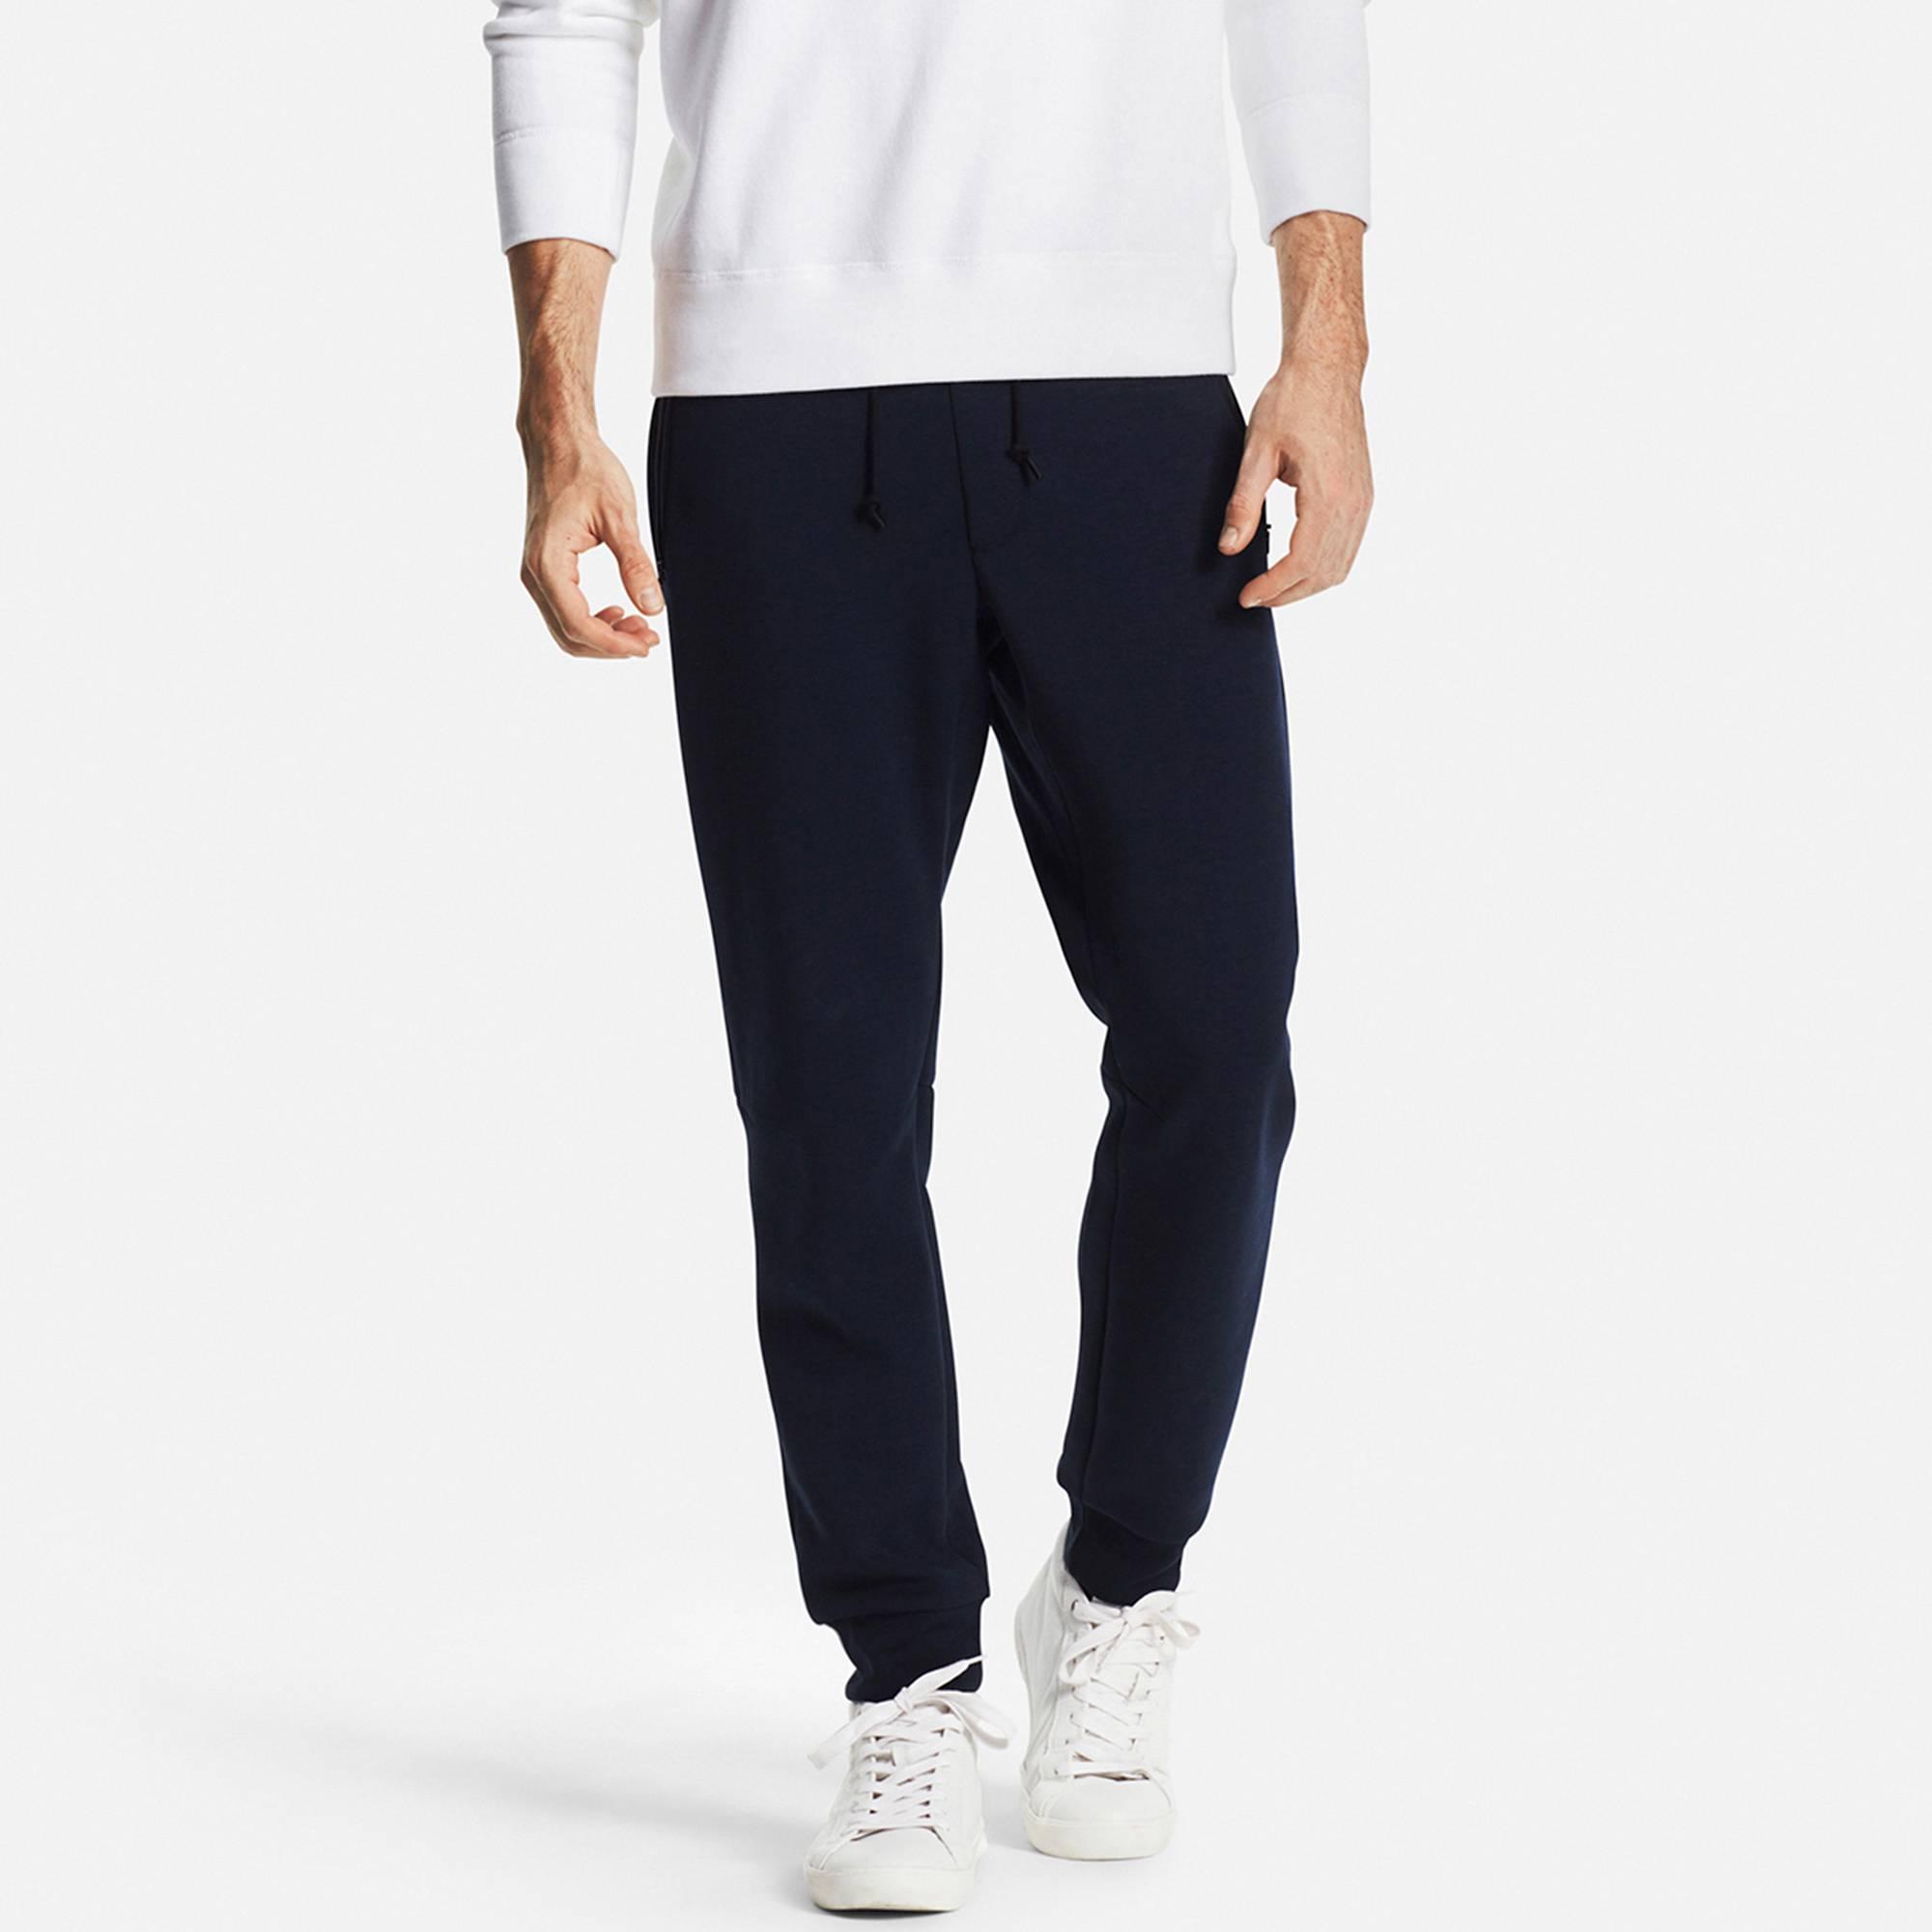 Men's DRY Stretch Sweatpants | UNIQLO US